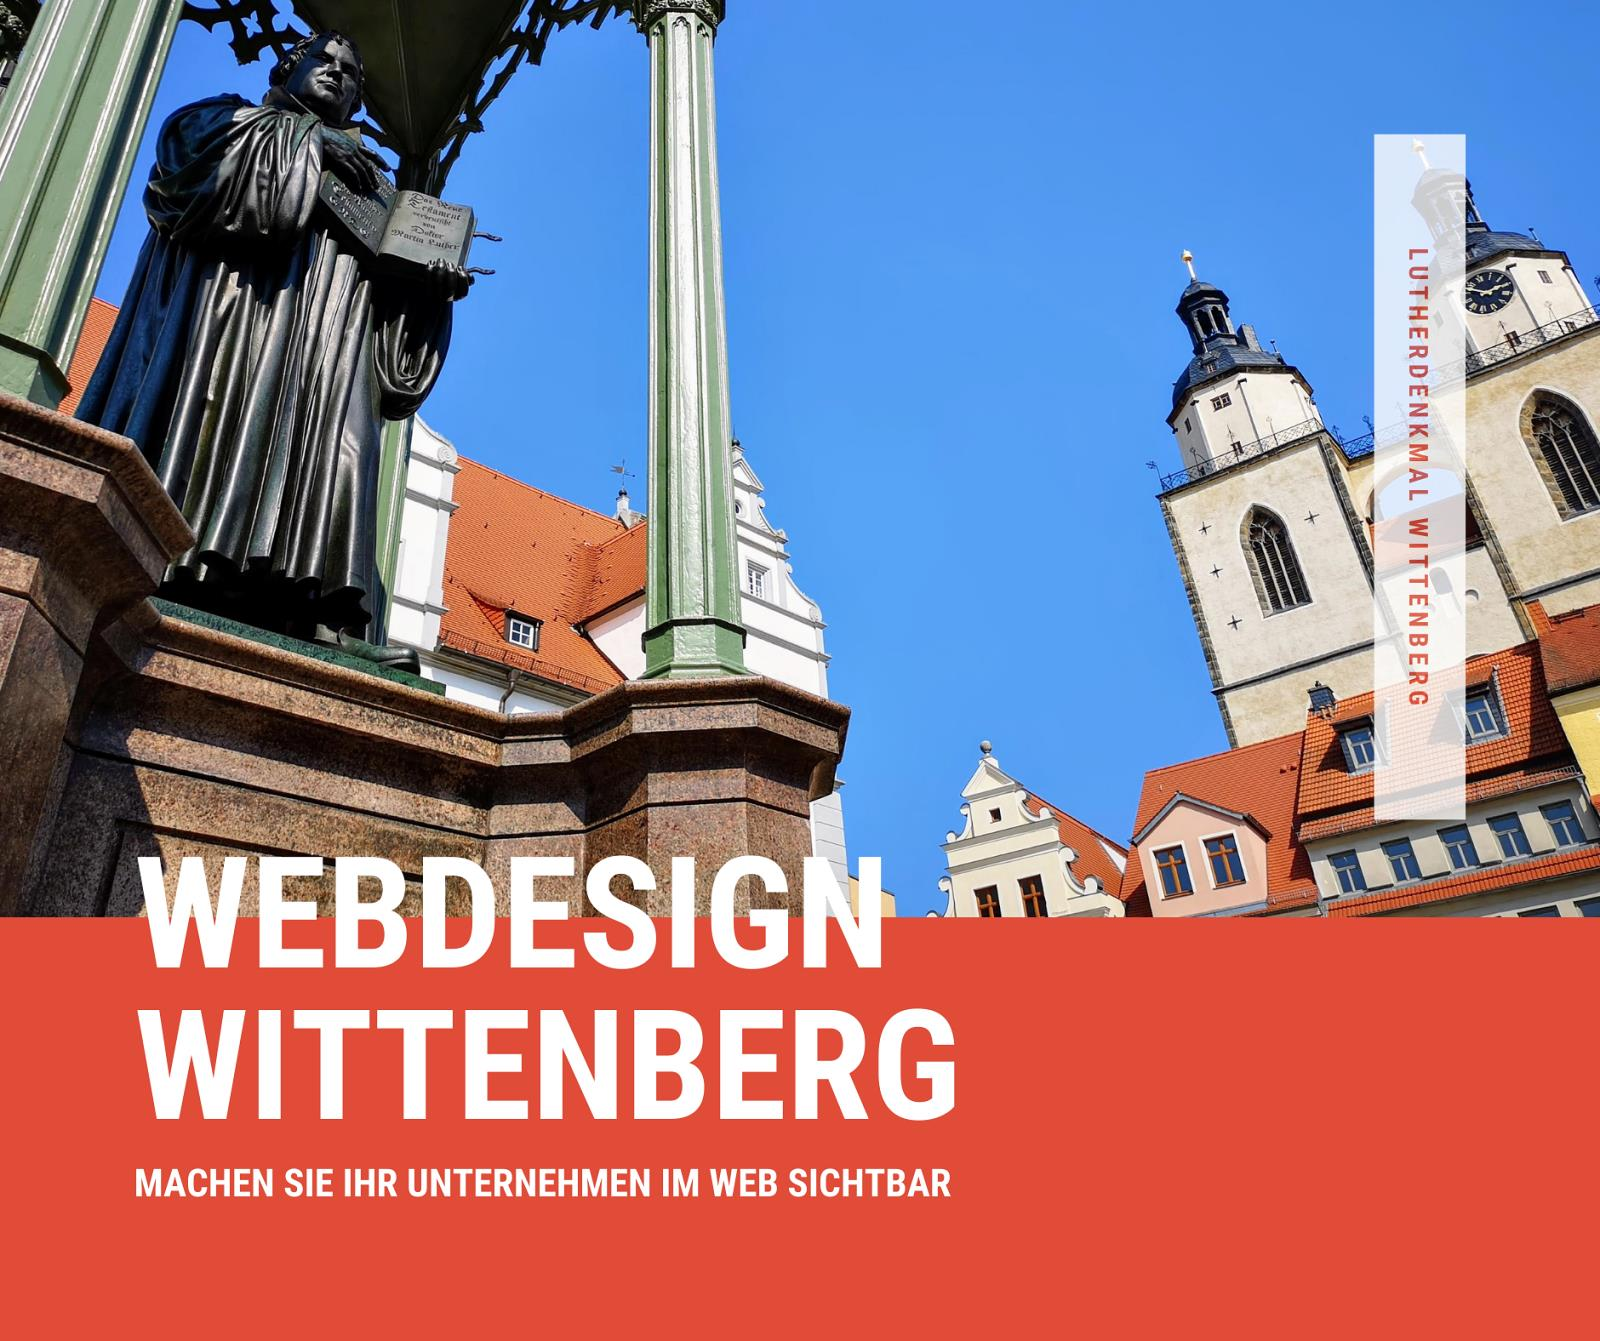 Webdesign Wittenberg